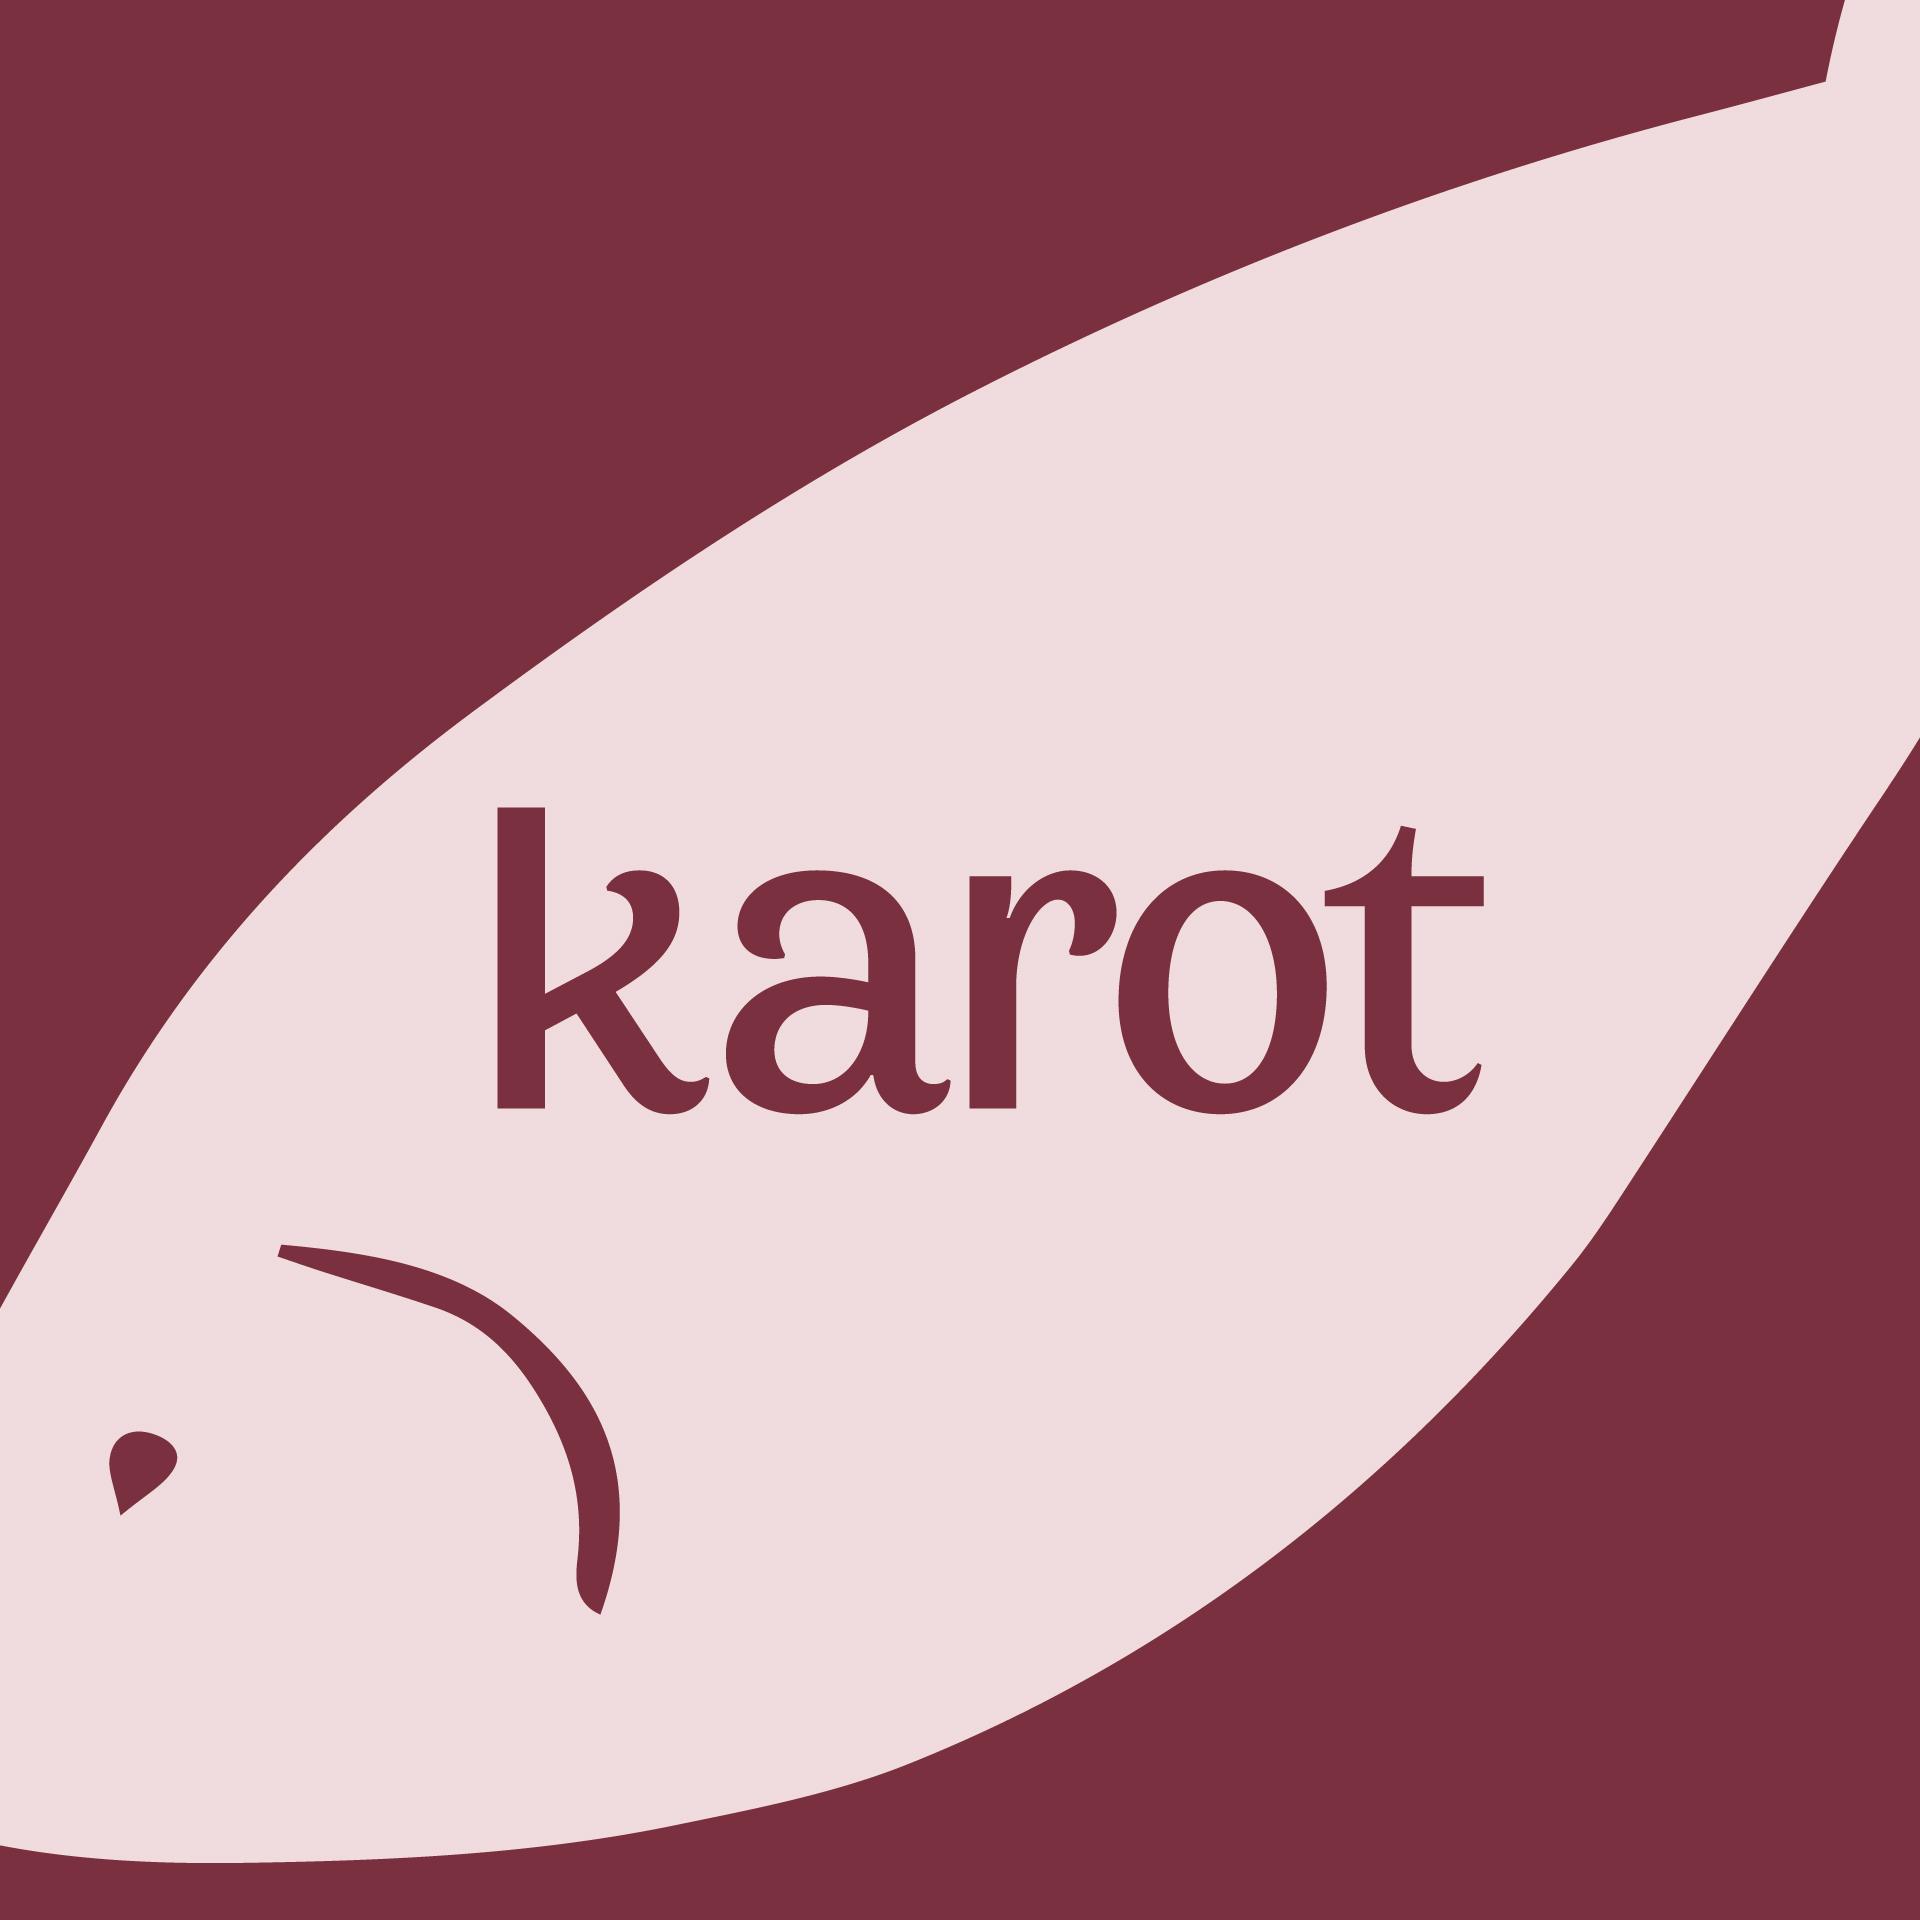 Karot-Brand-Identity-Design-16